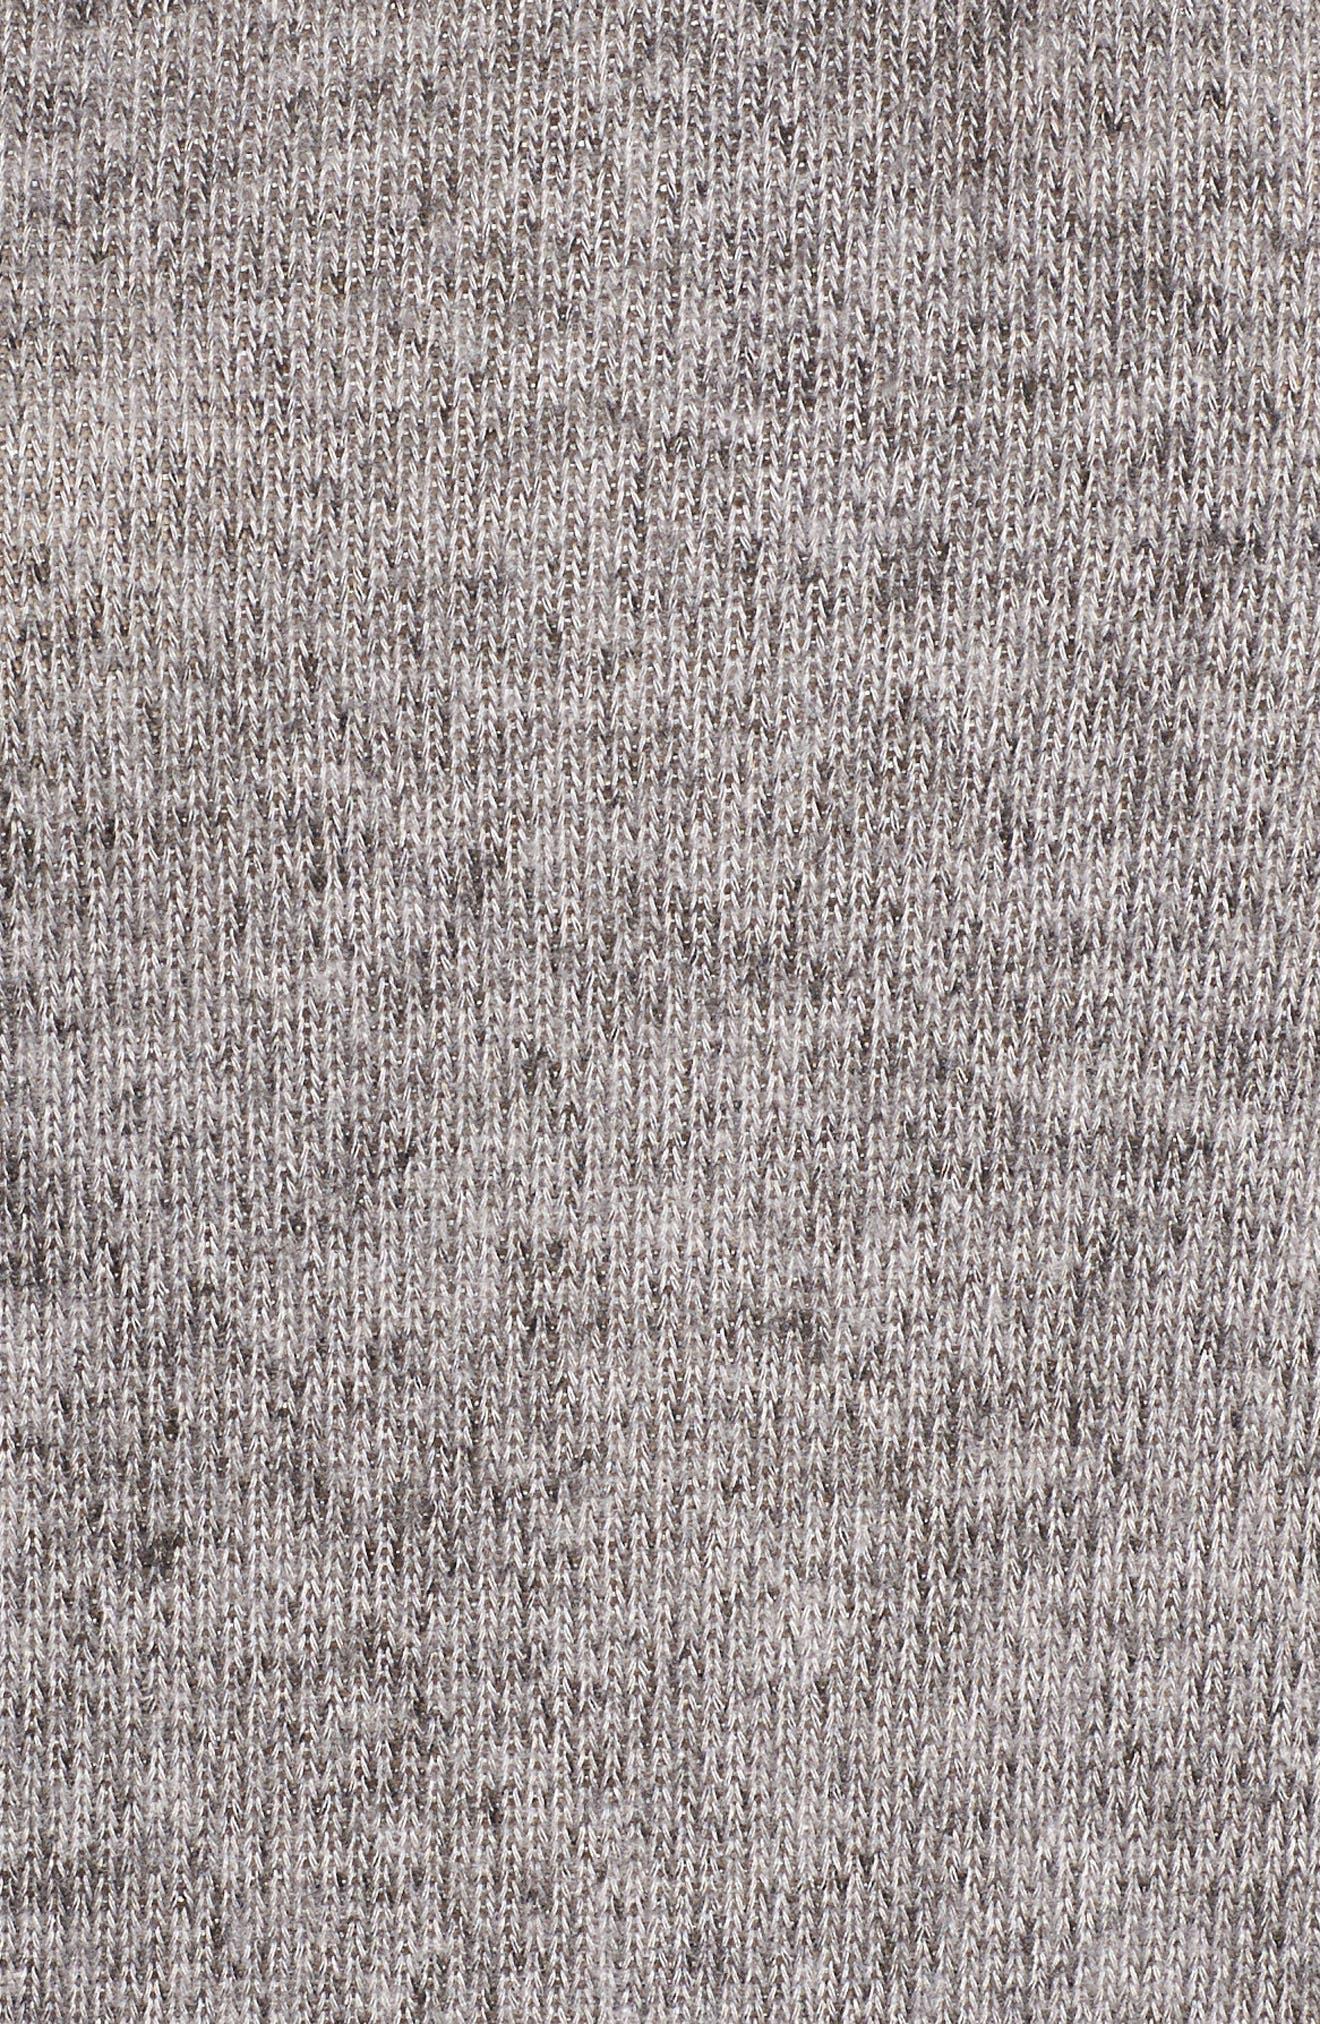 Hooded Knit Tunic,                             Alternate thumbnail 5, color,                             Light Grey